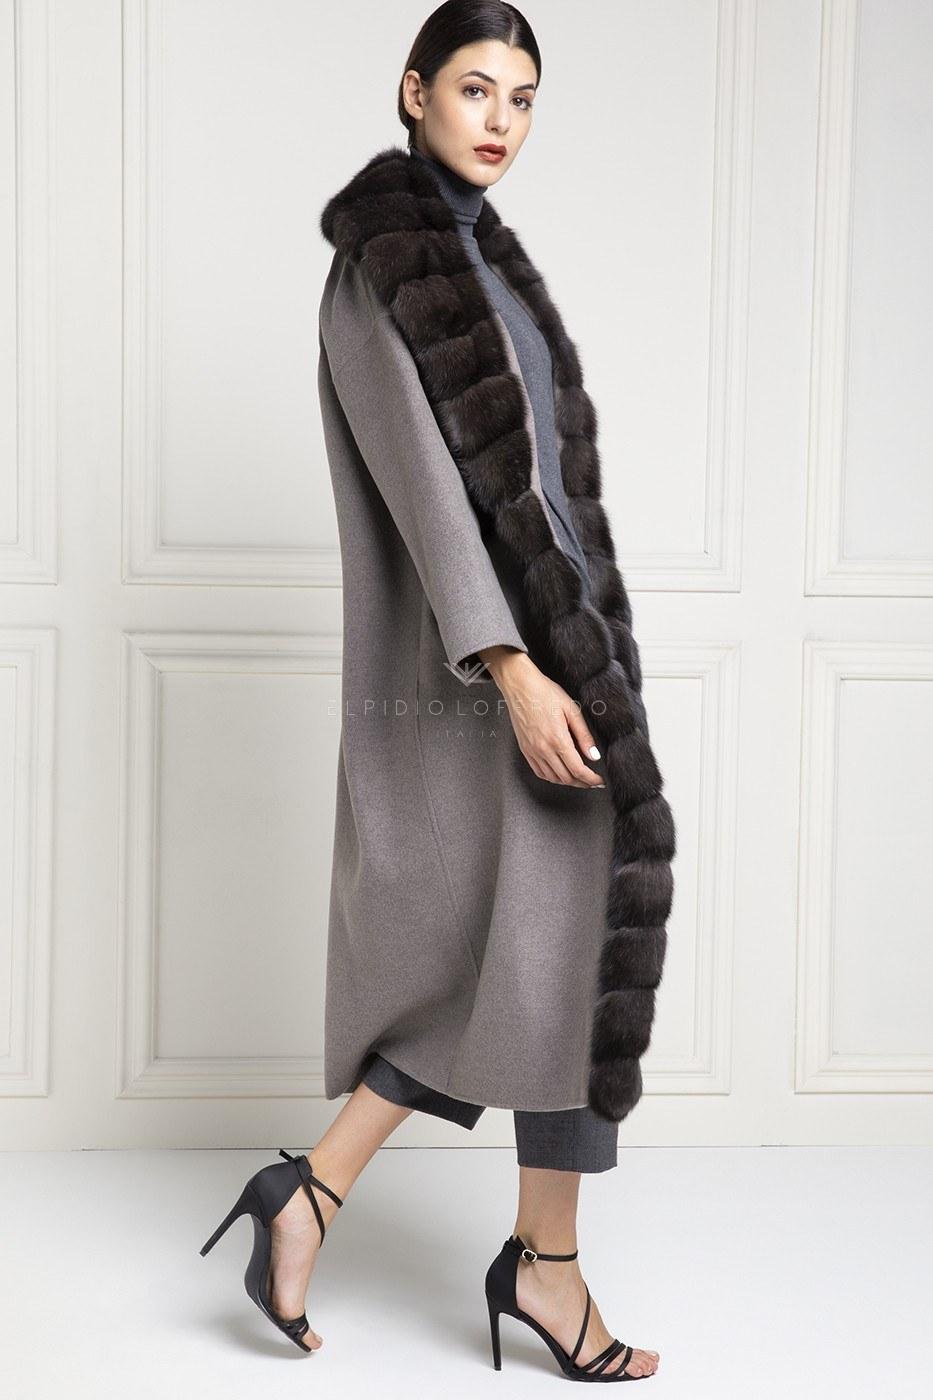 Cashmere Loro Piana Coat with Barguzinsky Russian Sable Fur and Shawl Collar